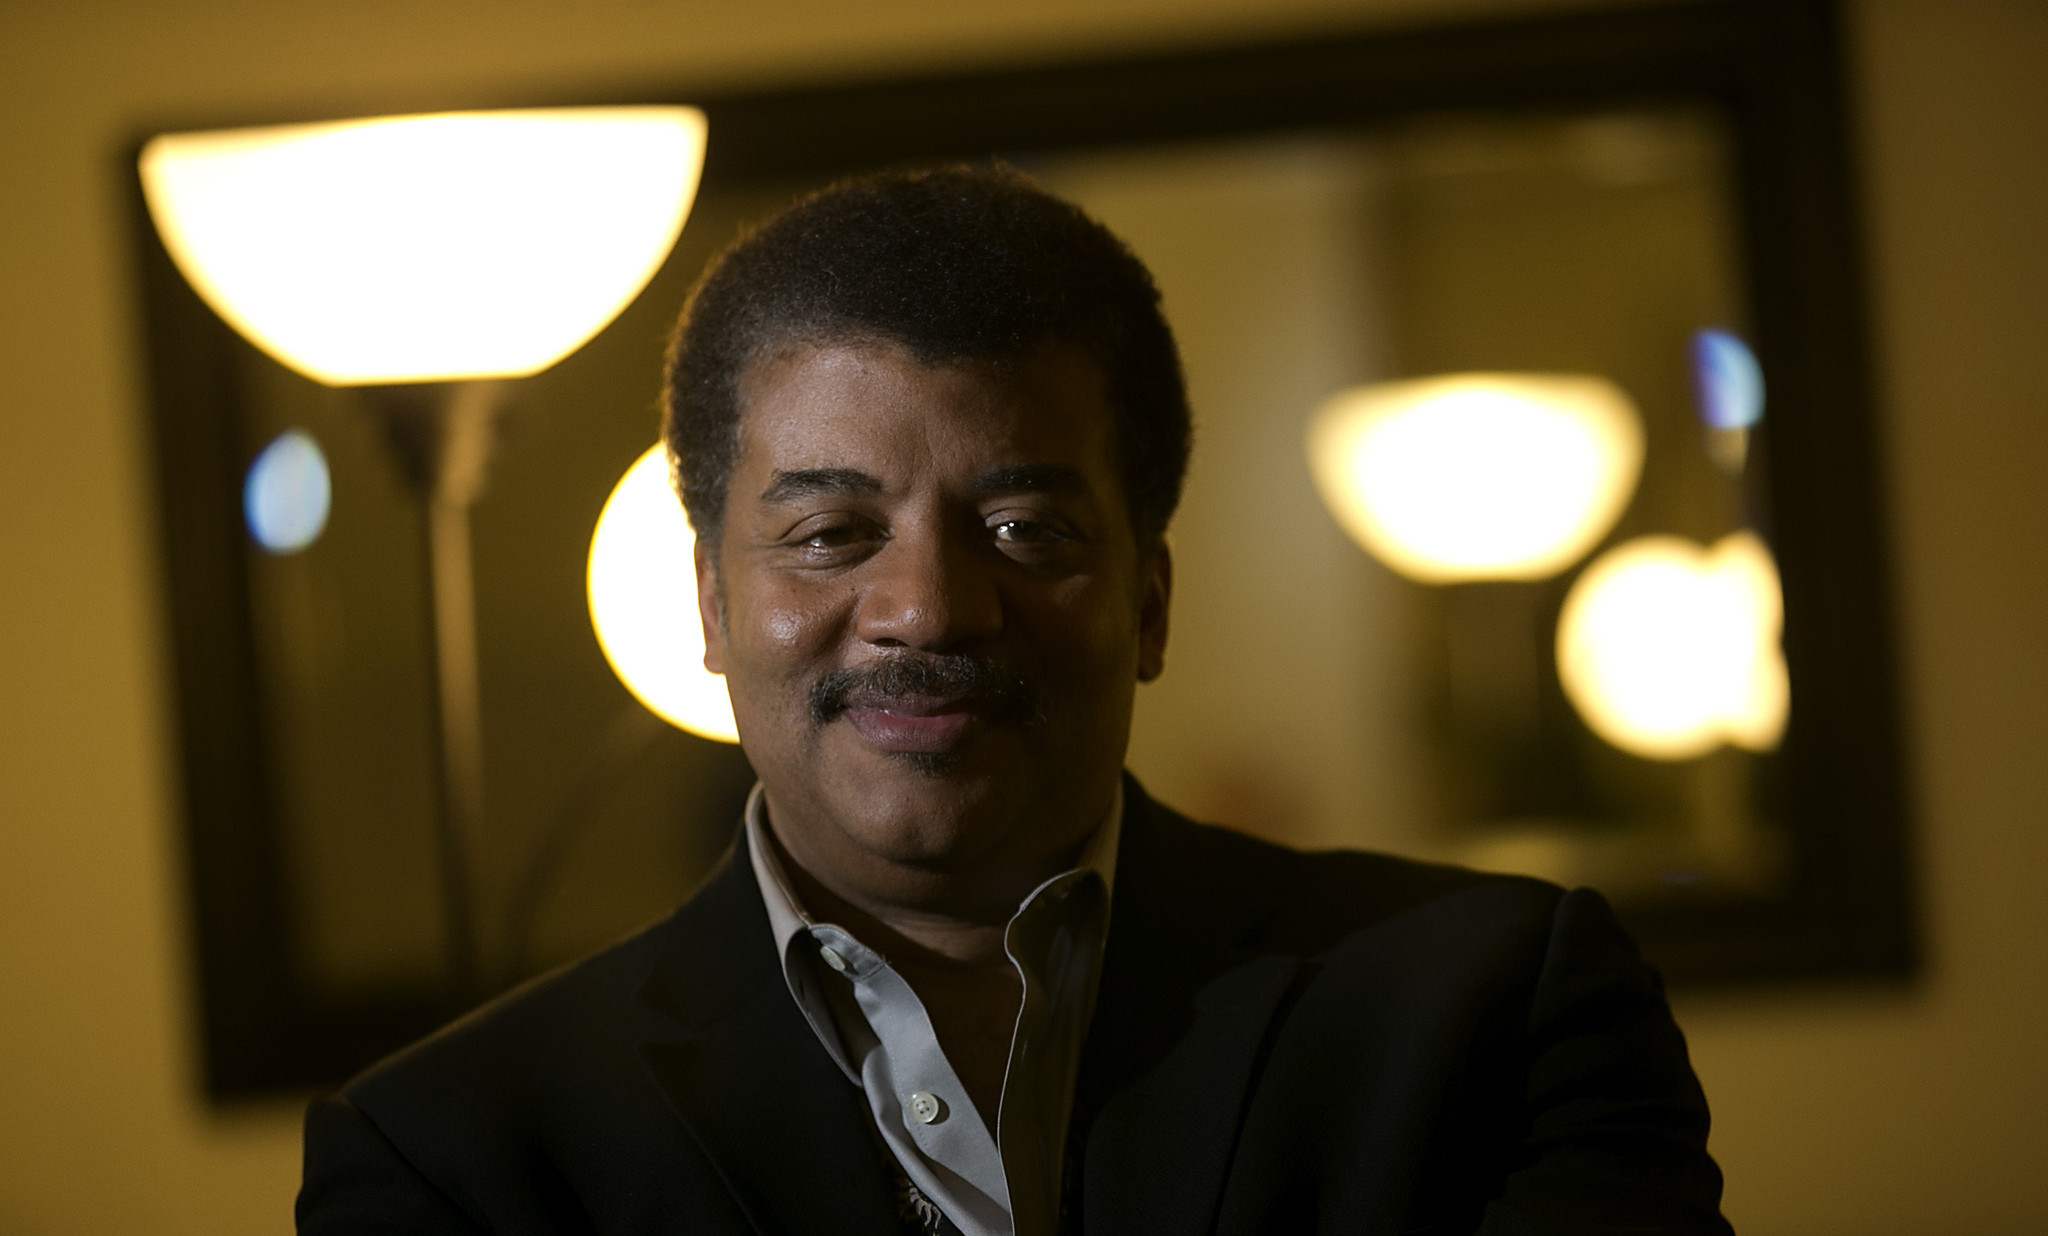 Neil deGrasse Tyson's theory: 'StarTalk' can make science hip